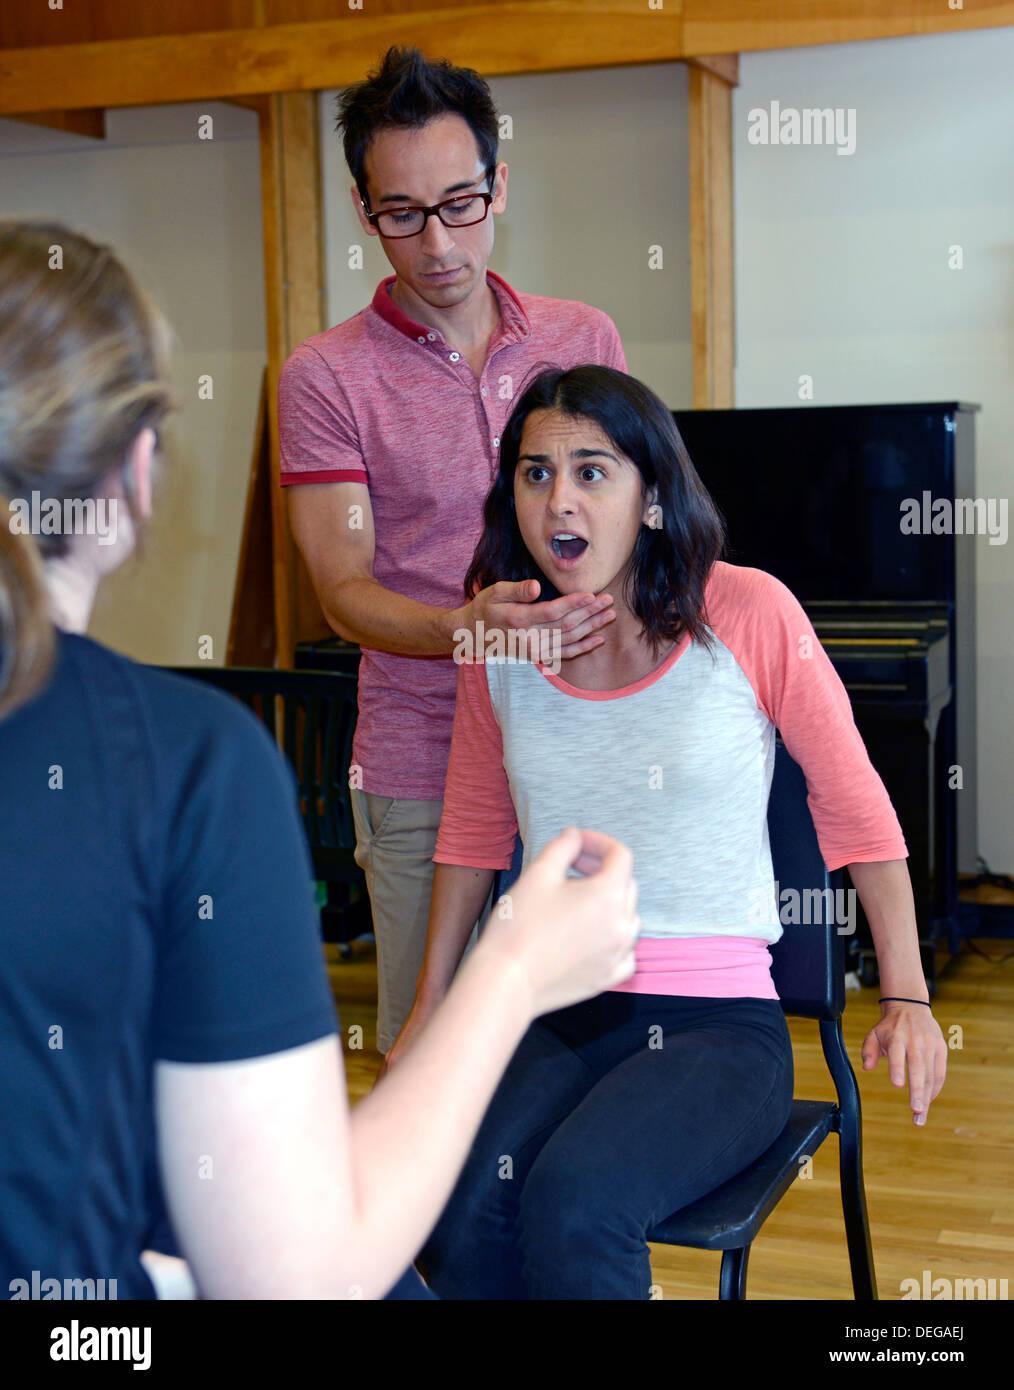 Jon Blake Hackler teaches a drama class at the Yale Summer School. - Stock Image